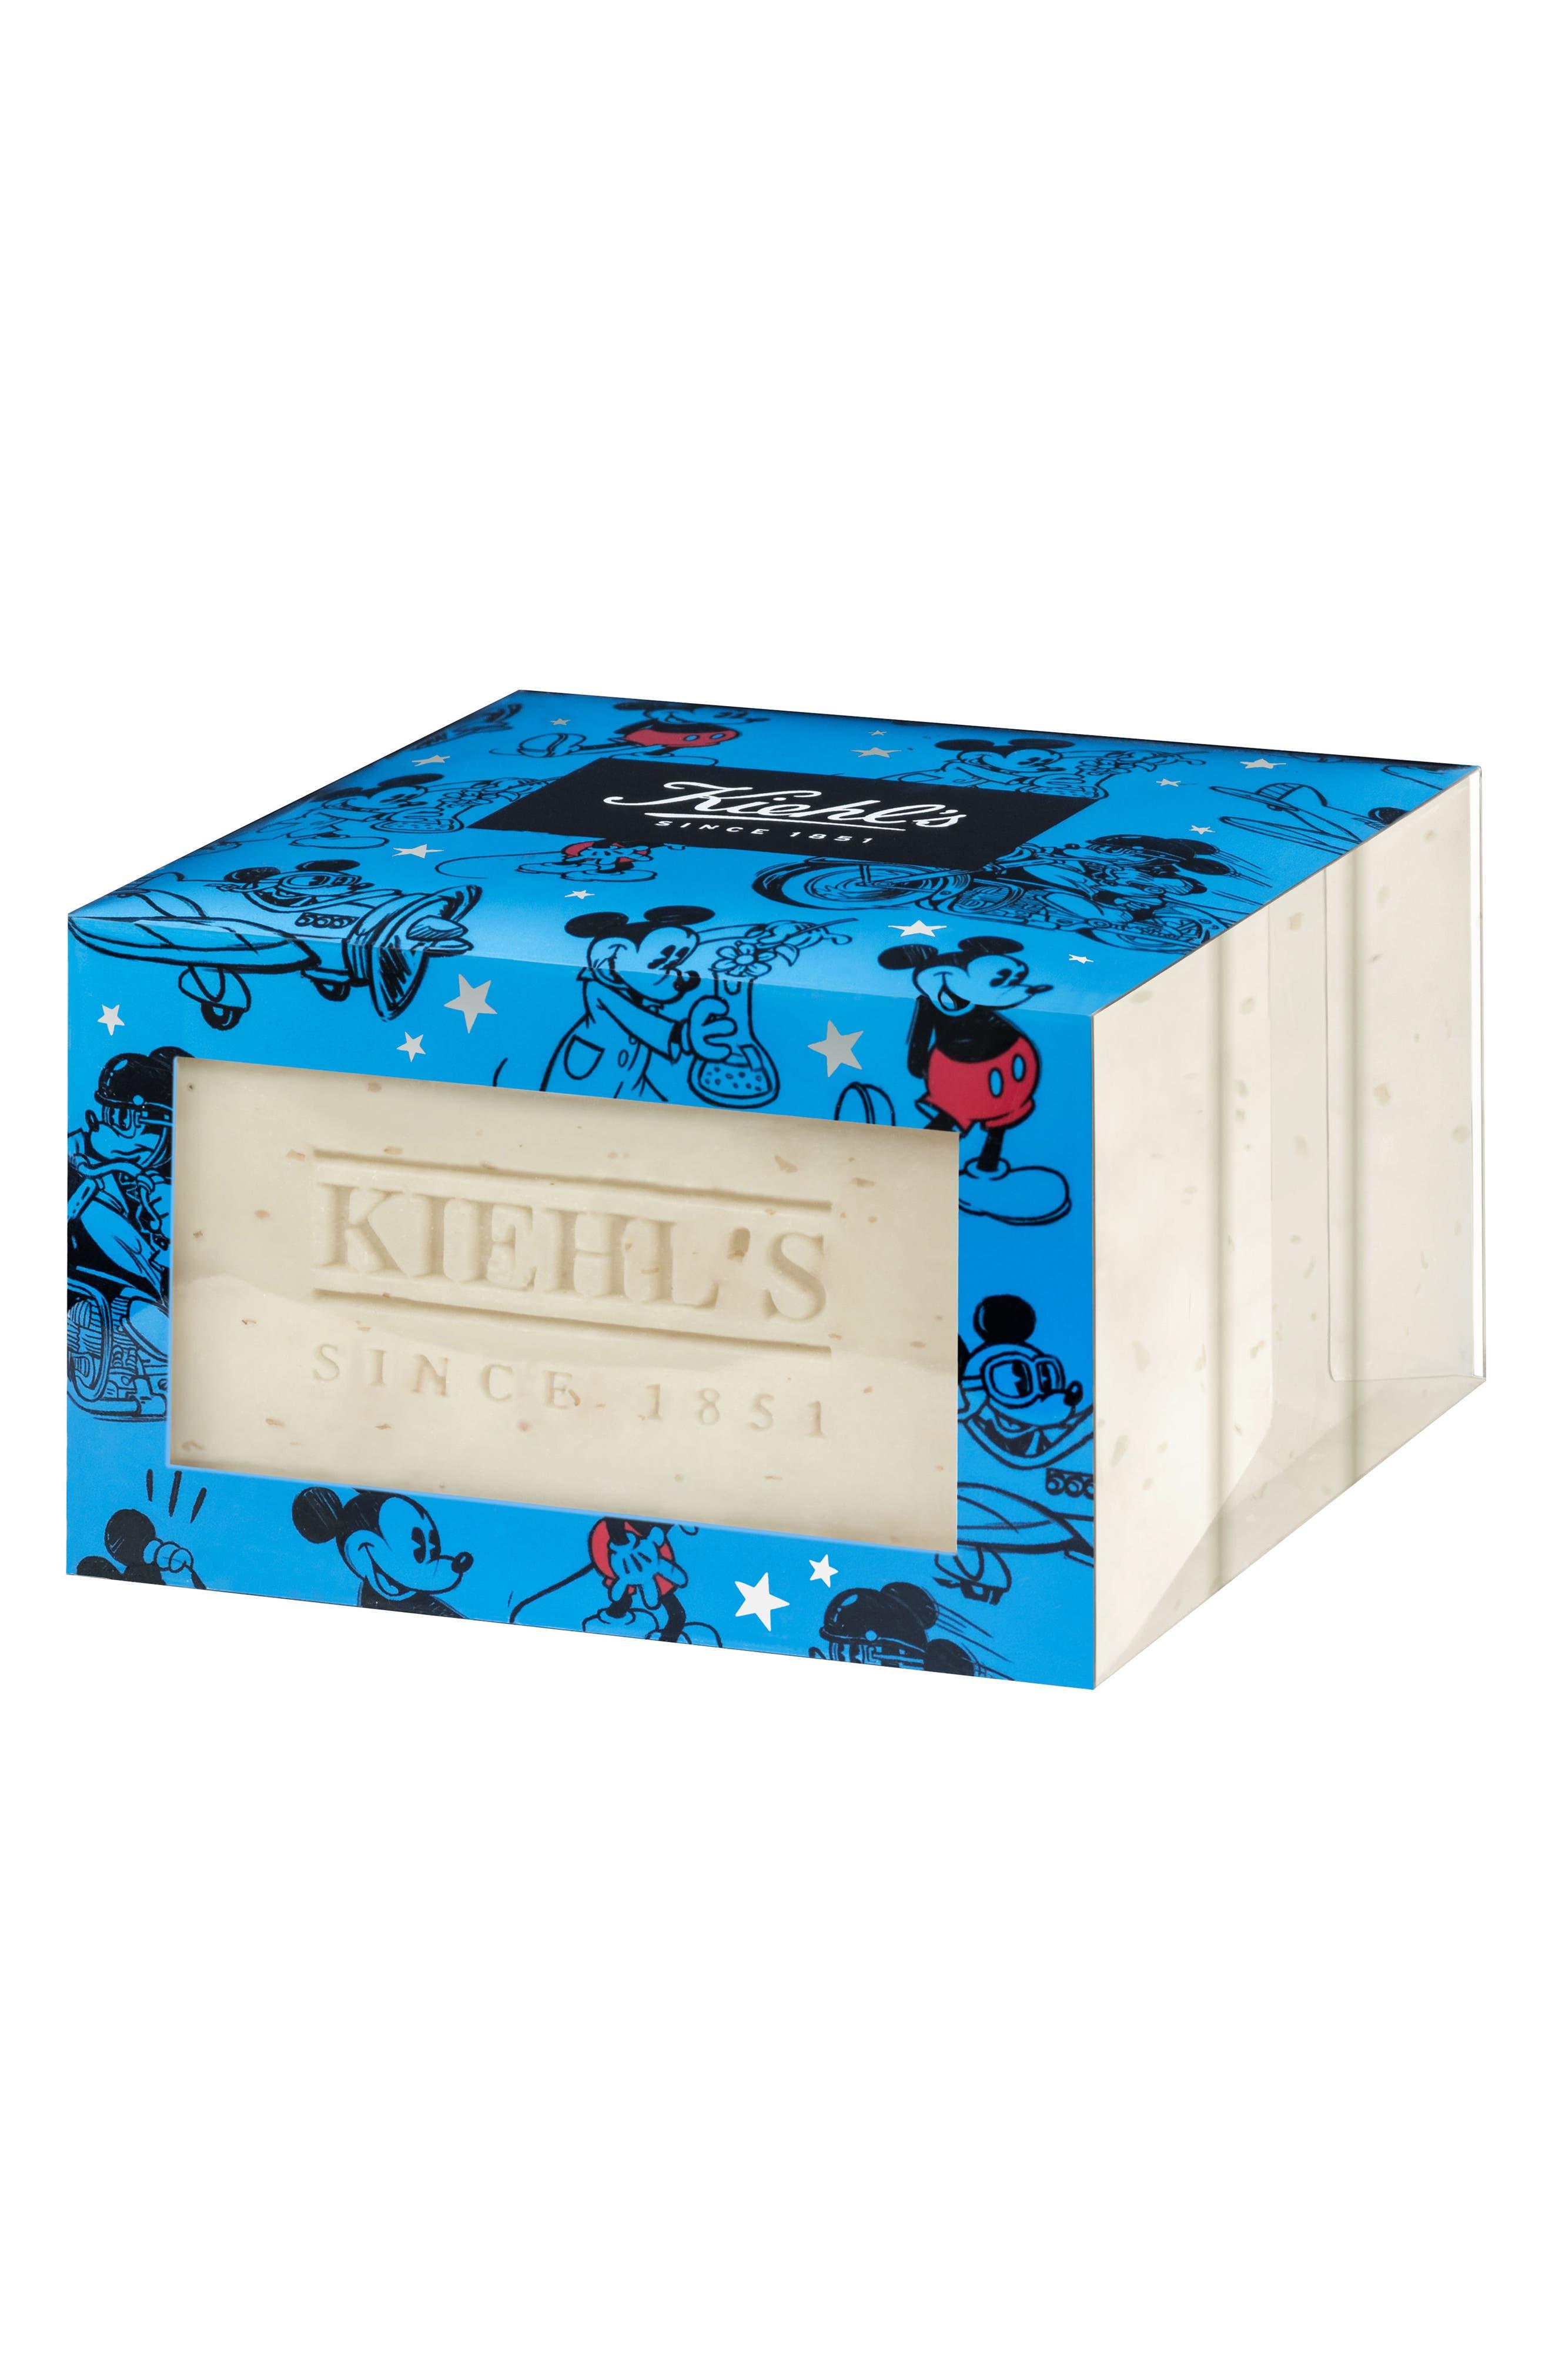 Alternate Image 1 Selected - Disney x Kiehl's Since 1851 Ultimate Man Body Scrub Soap Trio ($45 Value)